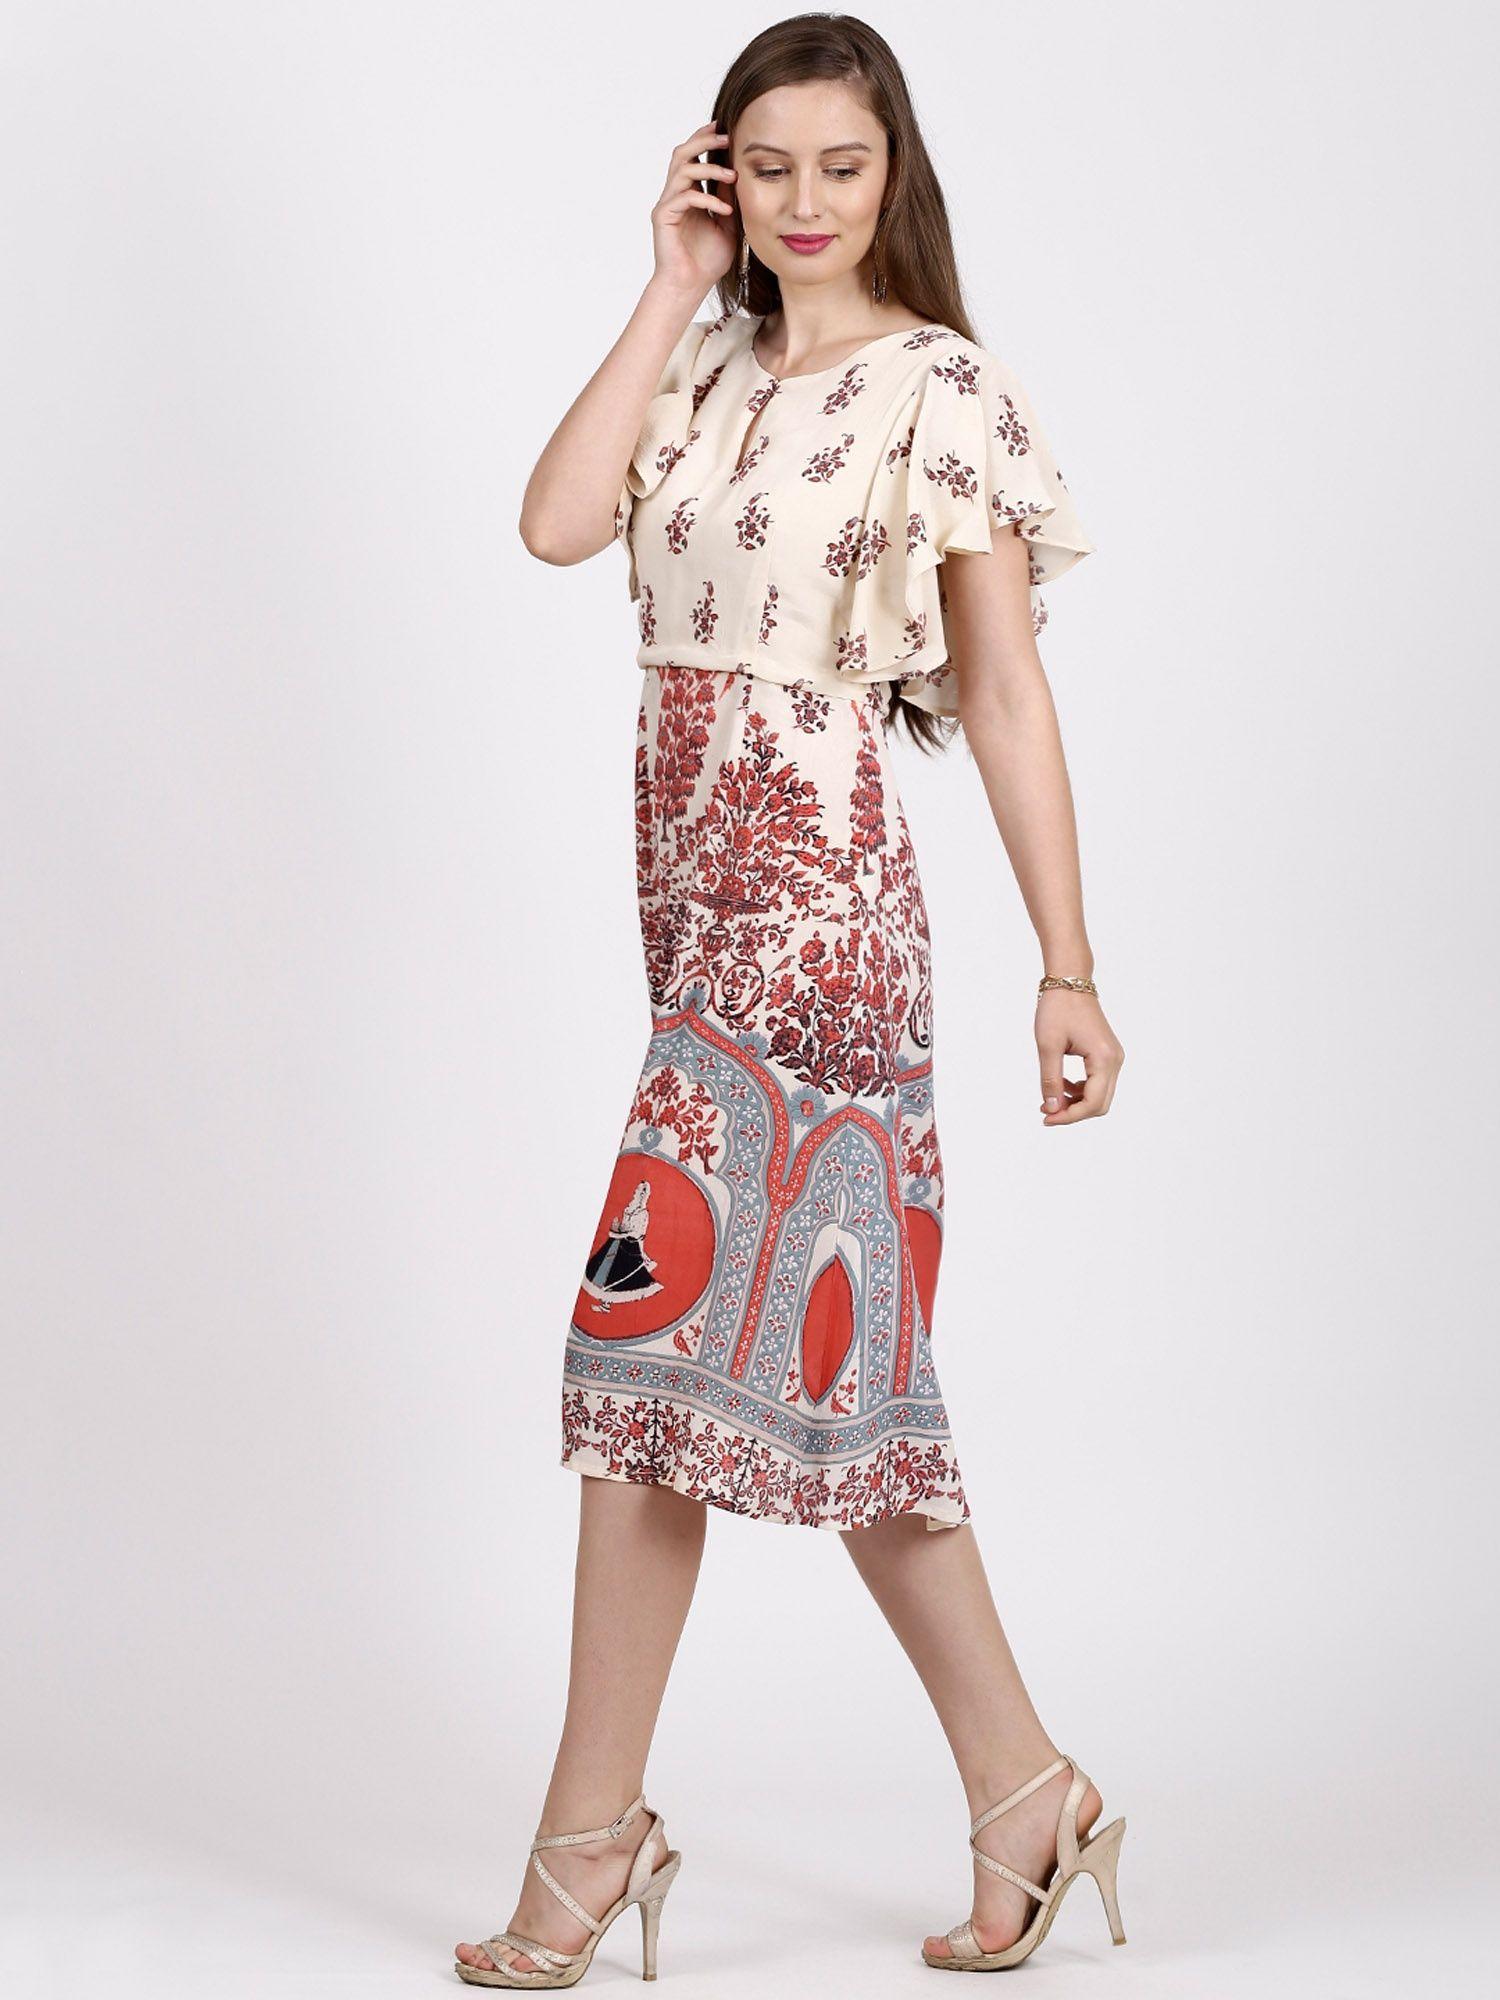 Label By Ritu Kumar >> Label Ritu Kumar Dresses : Buy Label Ritu Kumar Round Neck Half Sleeves Dress - Coral Online ...